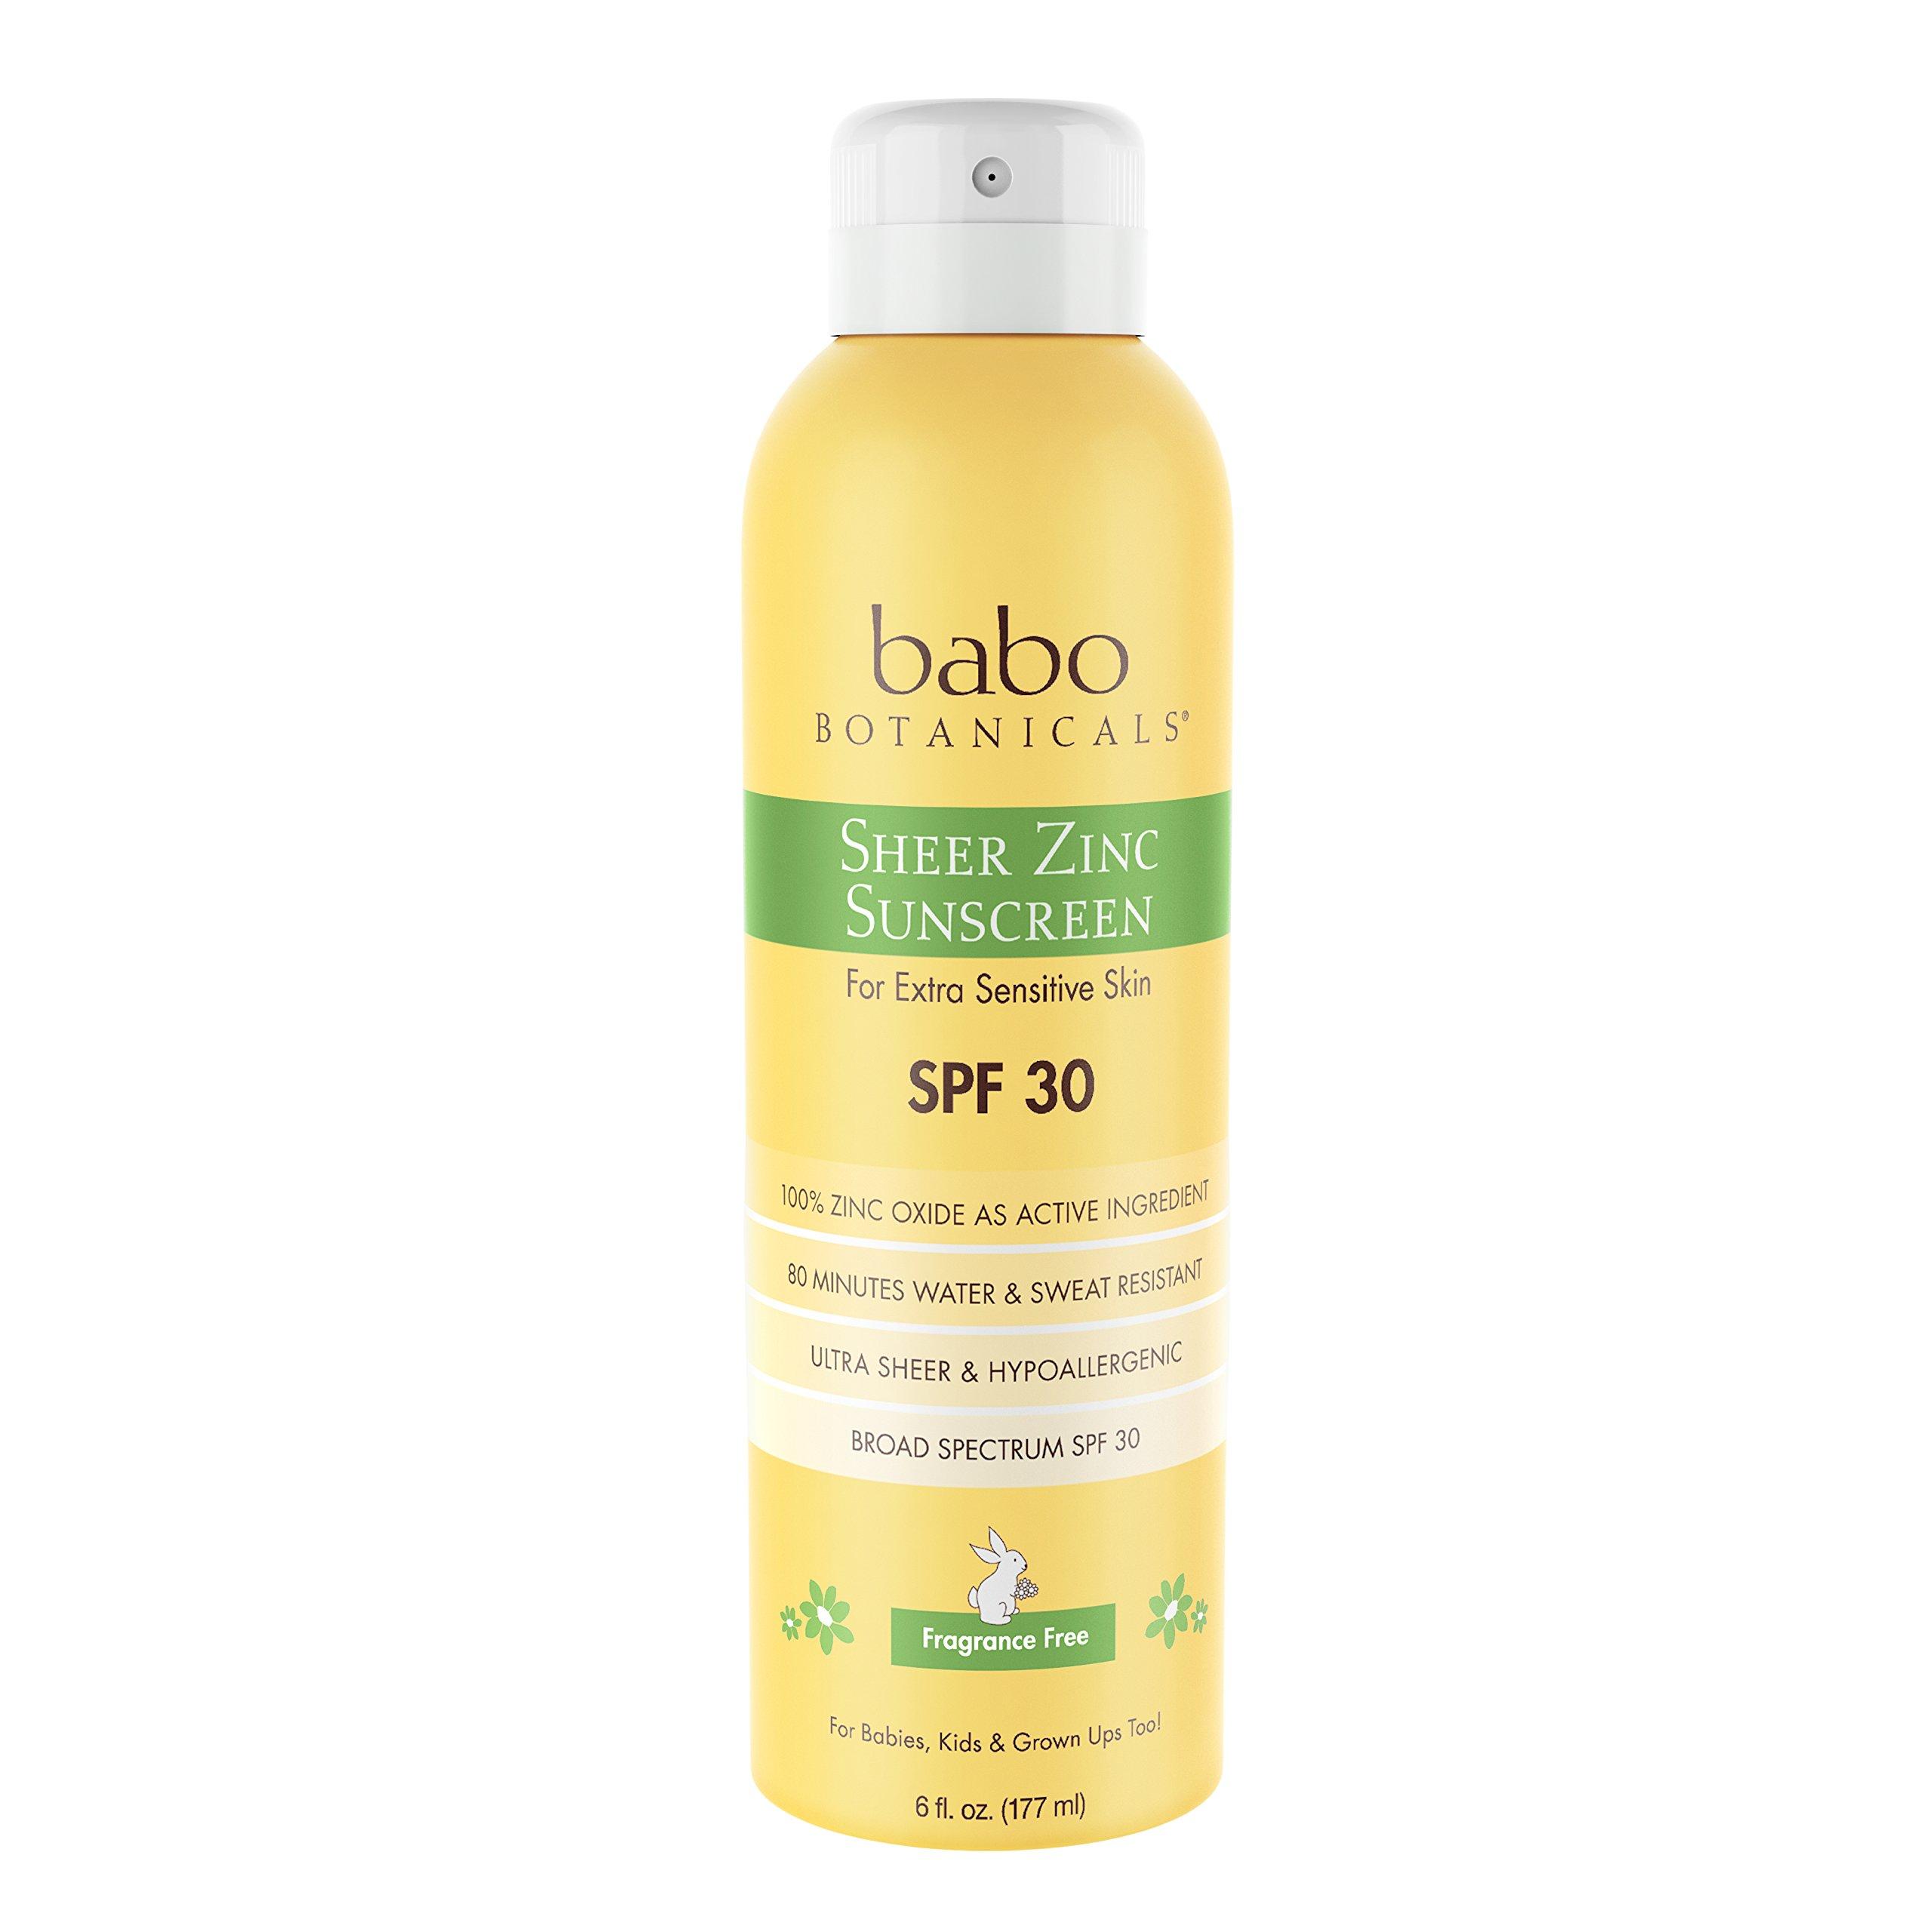 Babo Botanicals Sheer Zinc SPF 30 Natural Continuous Spray Fragrance Free Sunscreen for Sensitive Skin, Yellow